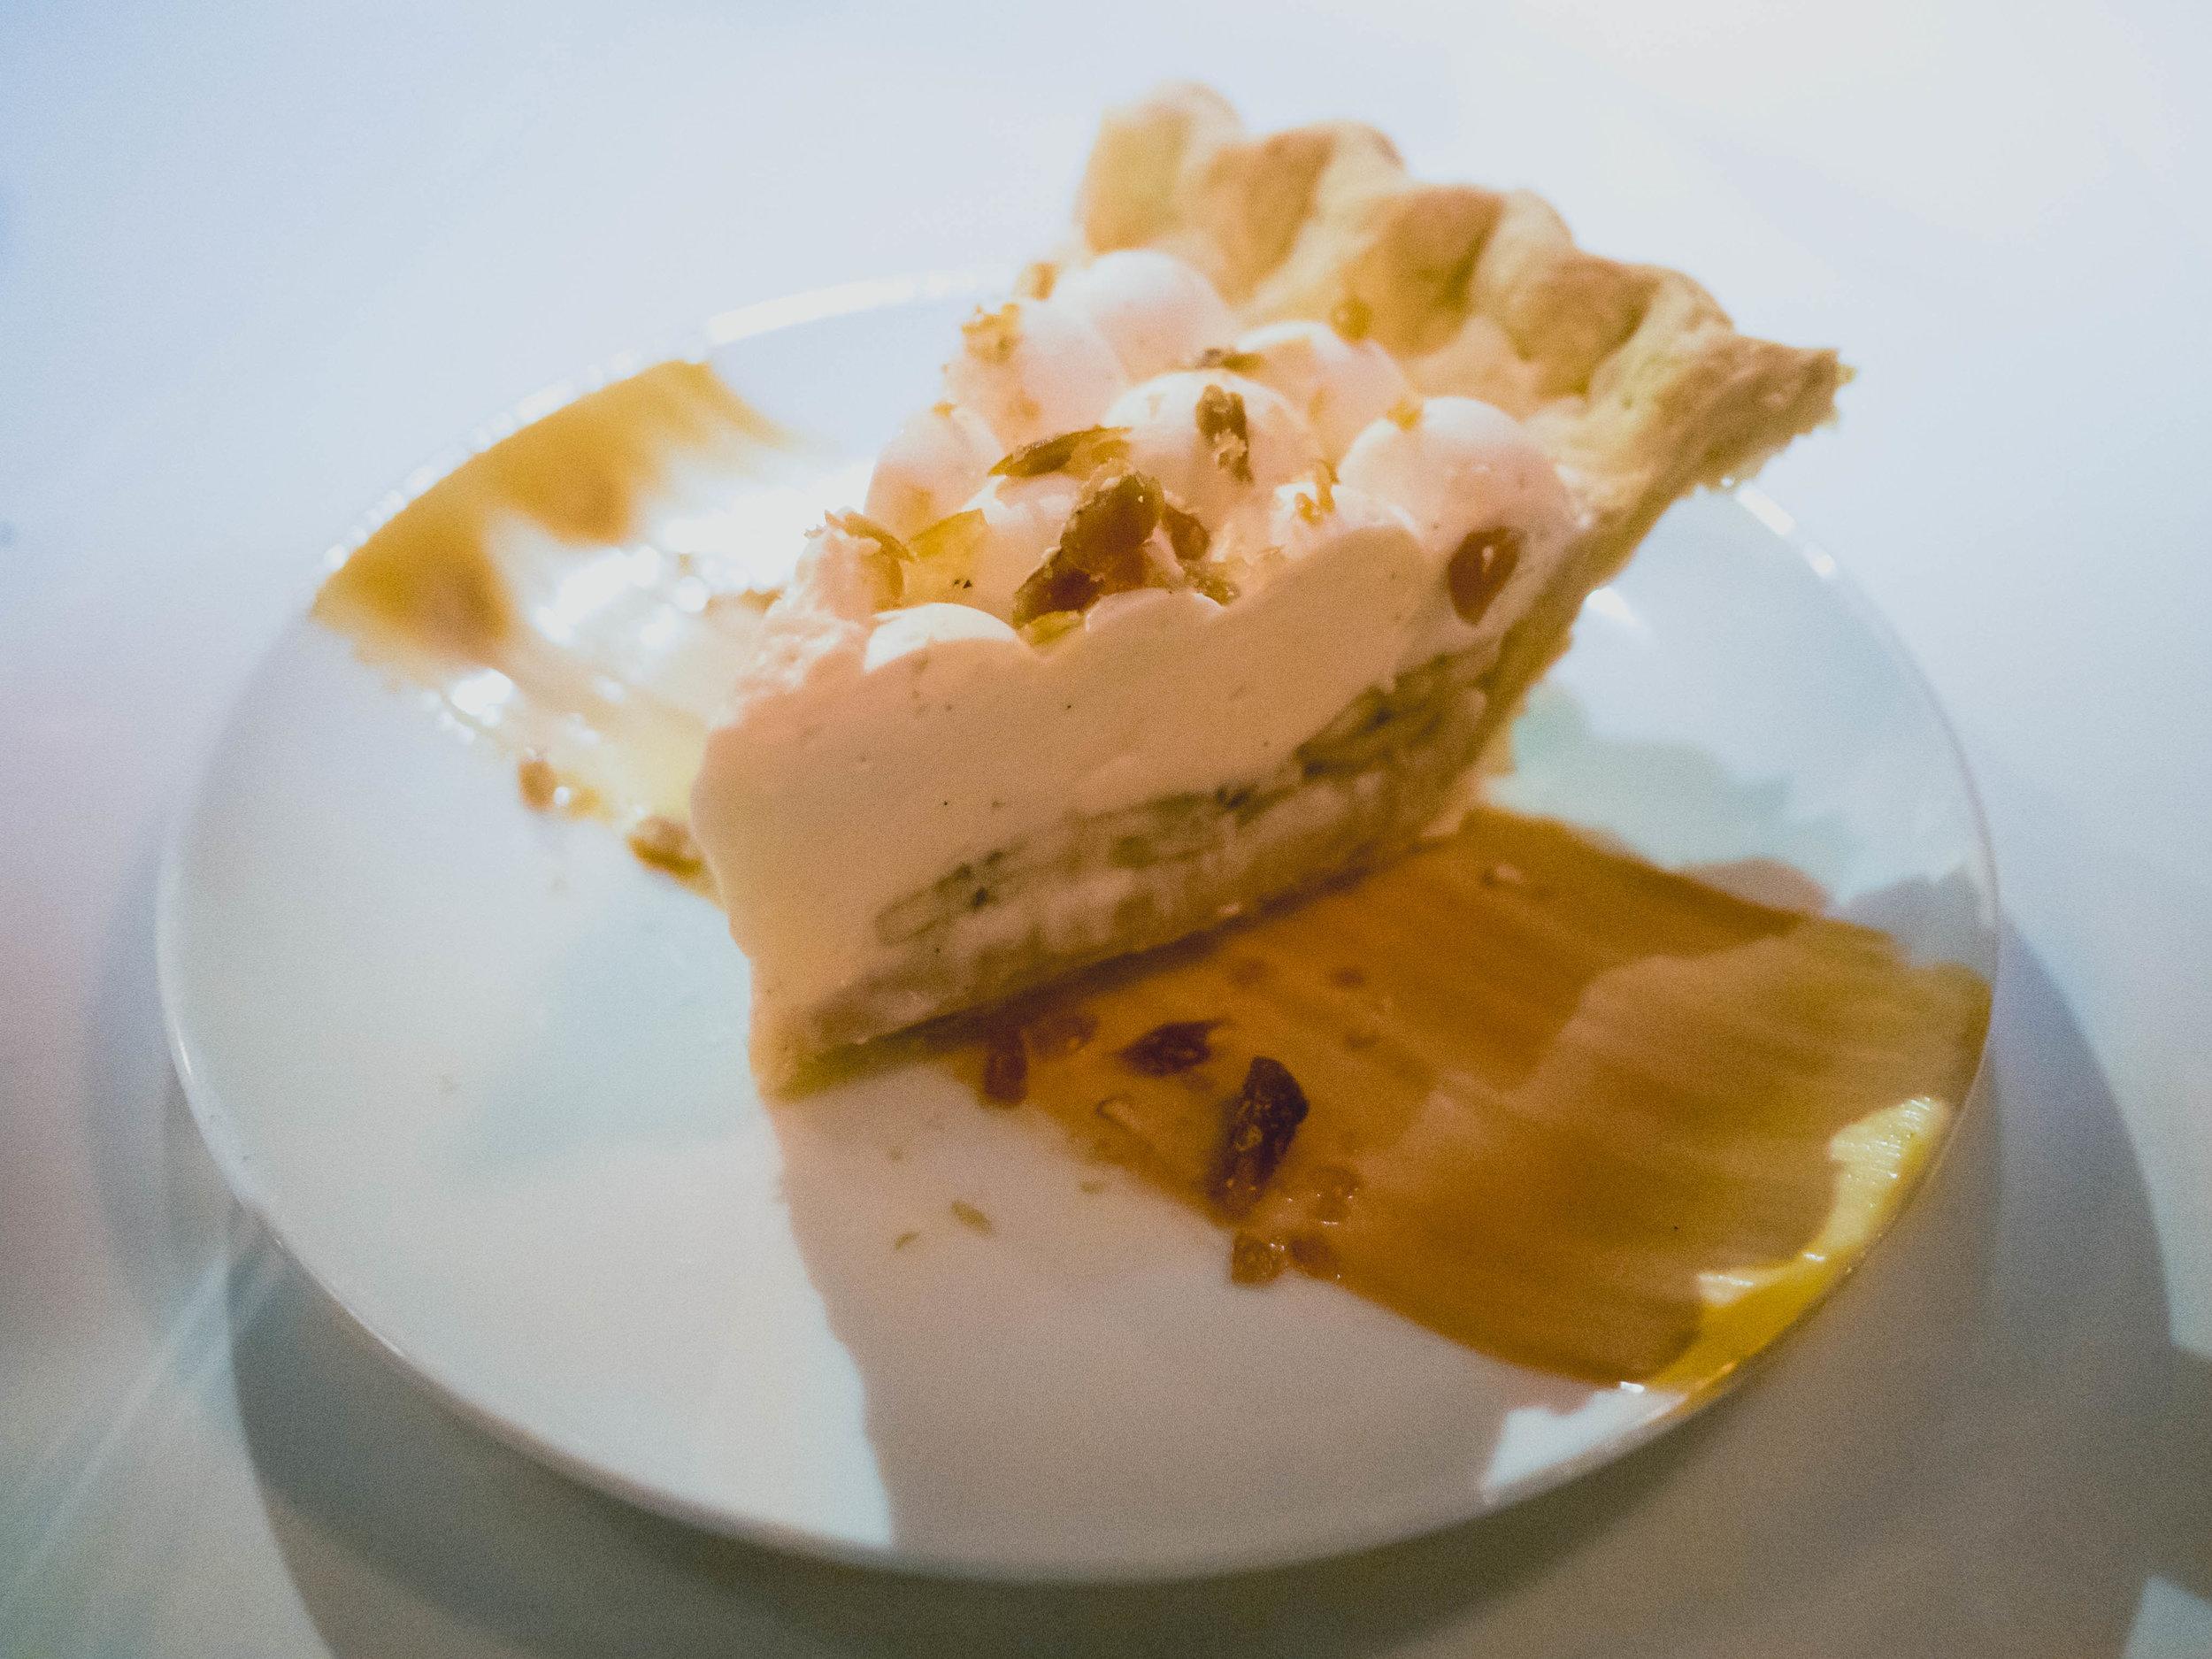 banana toffee cream pie  with toffee, fresh bananas, vanilla whipped cream.